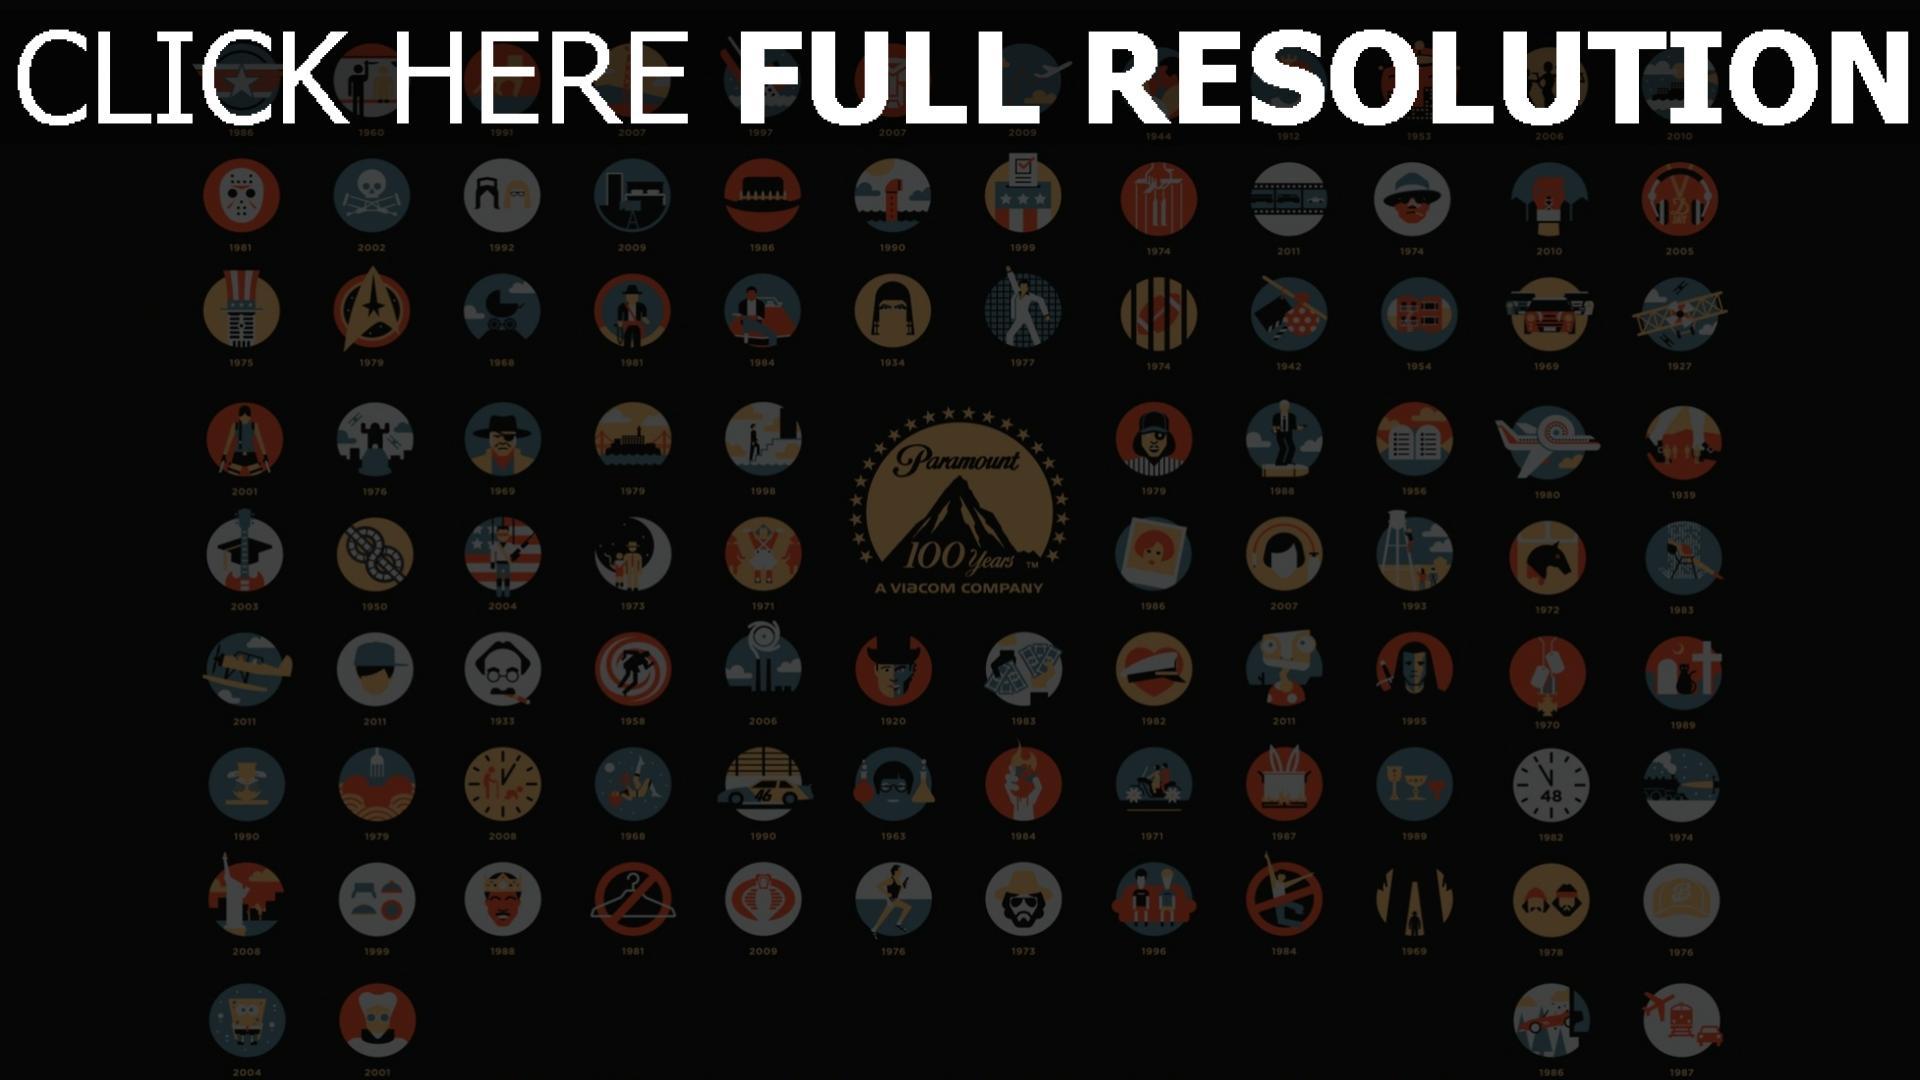 hd hintergrundbilder paramoumt jubiläum 100 jahre logos filme 1920x1080